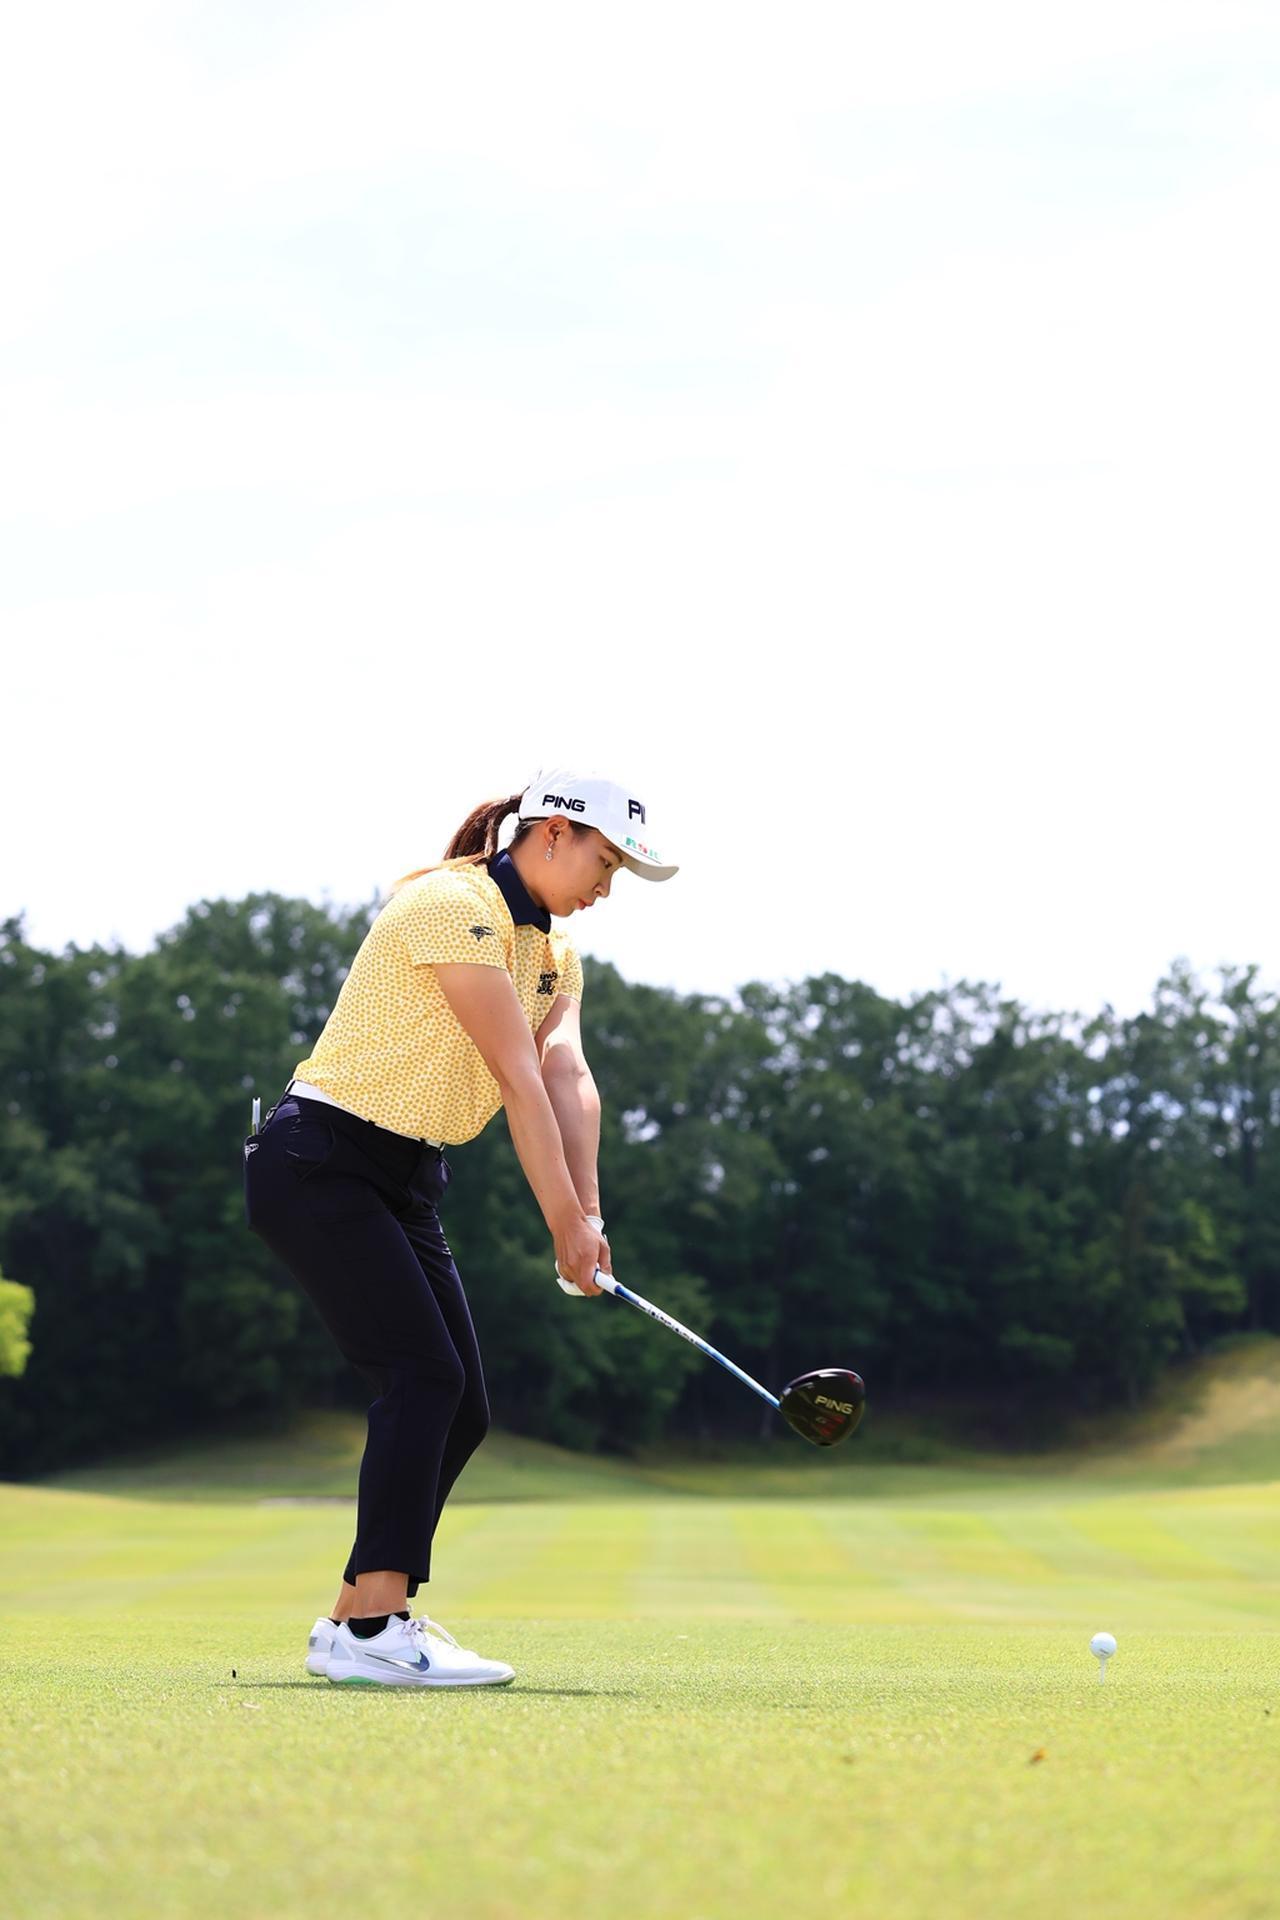 Images : 3番目の画像 - 渋野日向子のドライバー後方連続写真 - みんなのゴルフダイジェスト